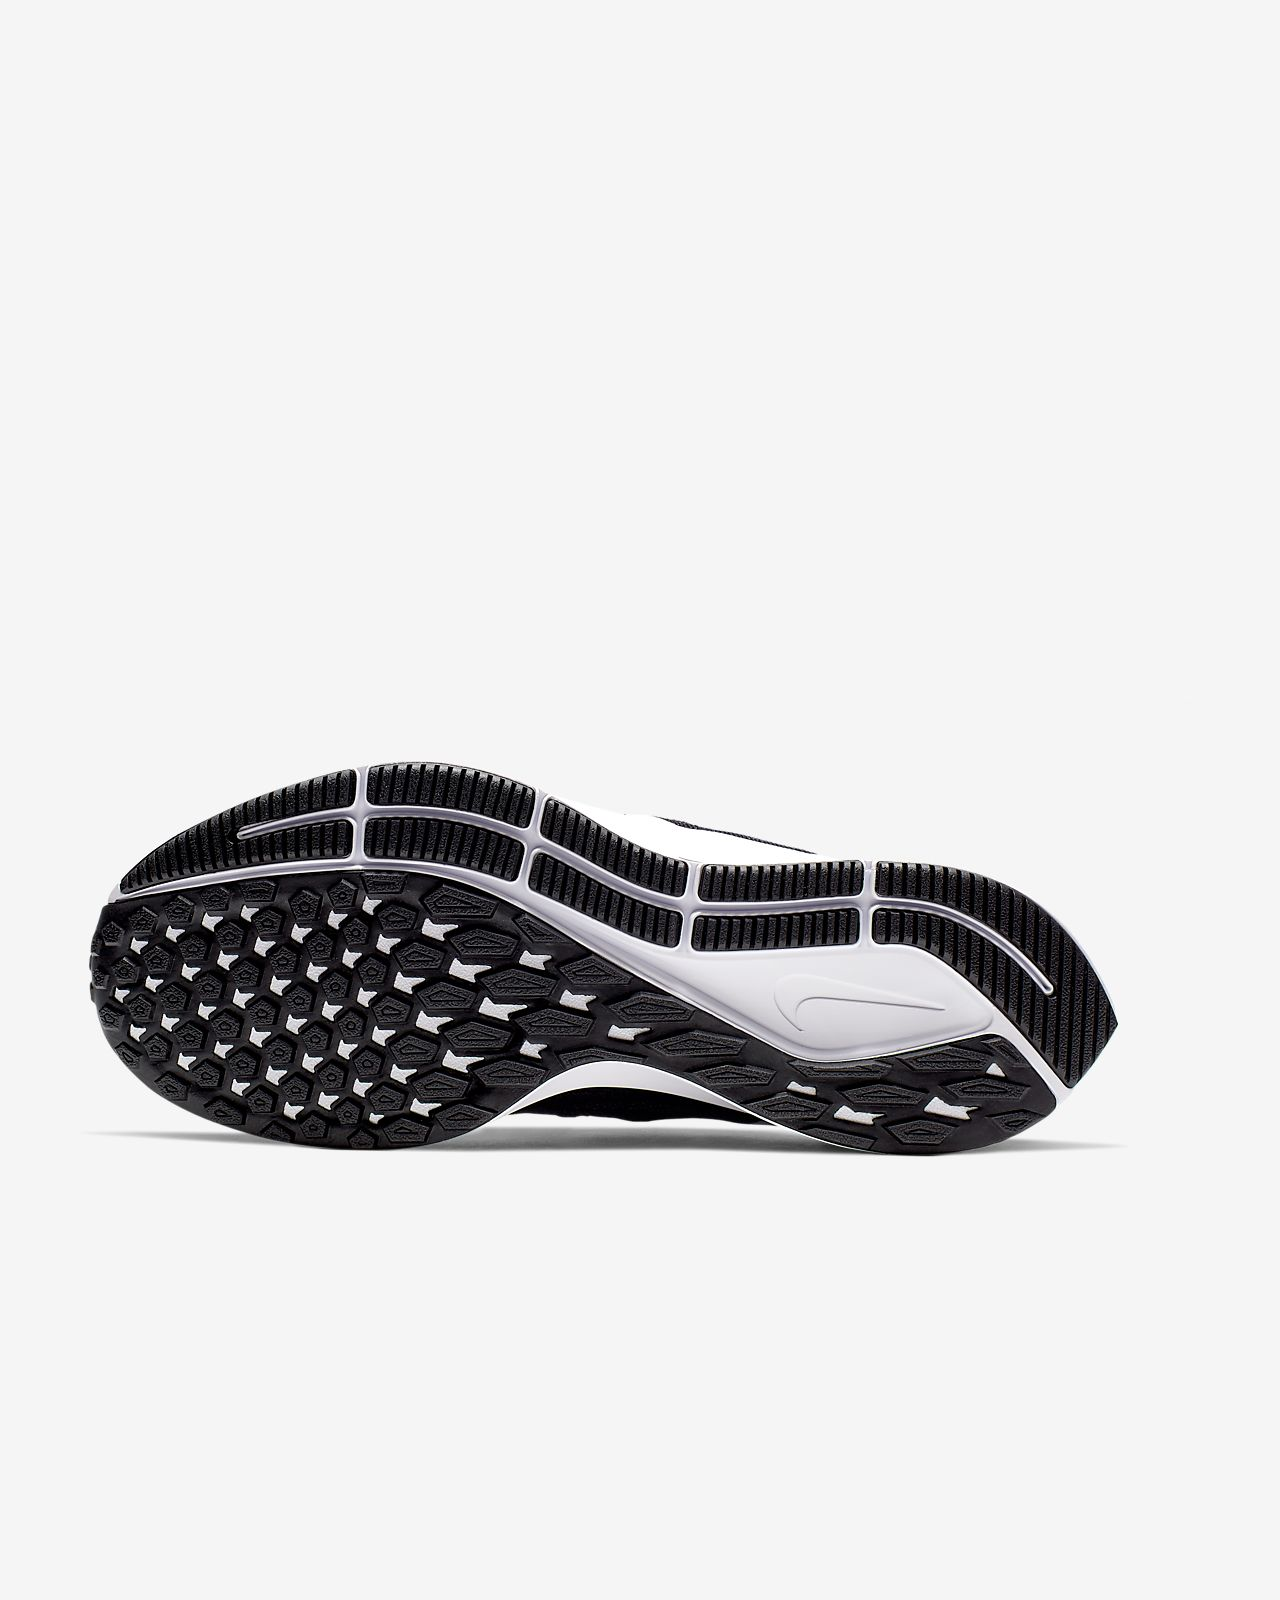 Chaussure de running Nike Air Zoom Pegasus 36 pour Femme (large)